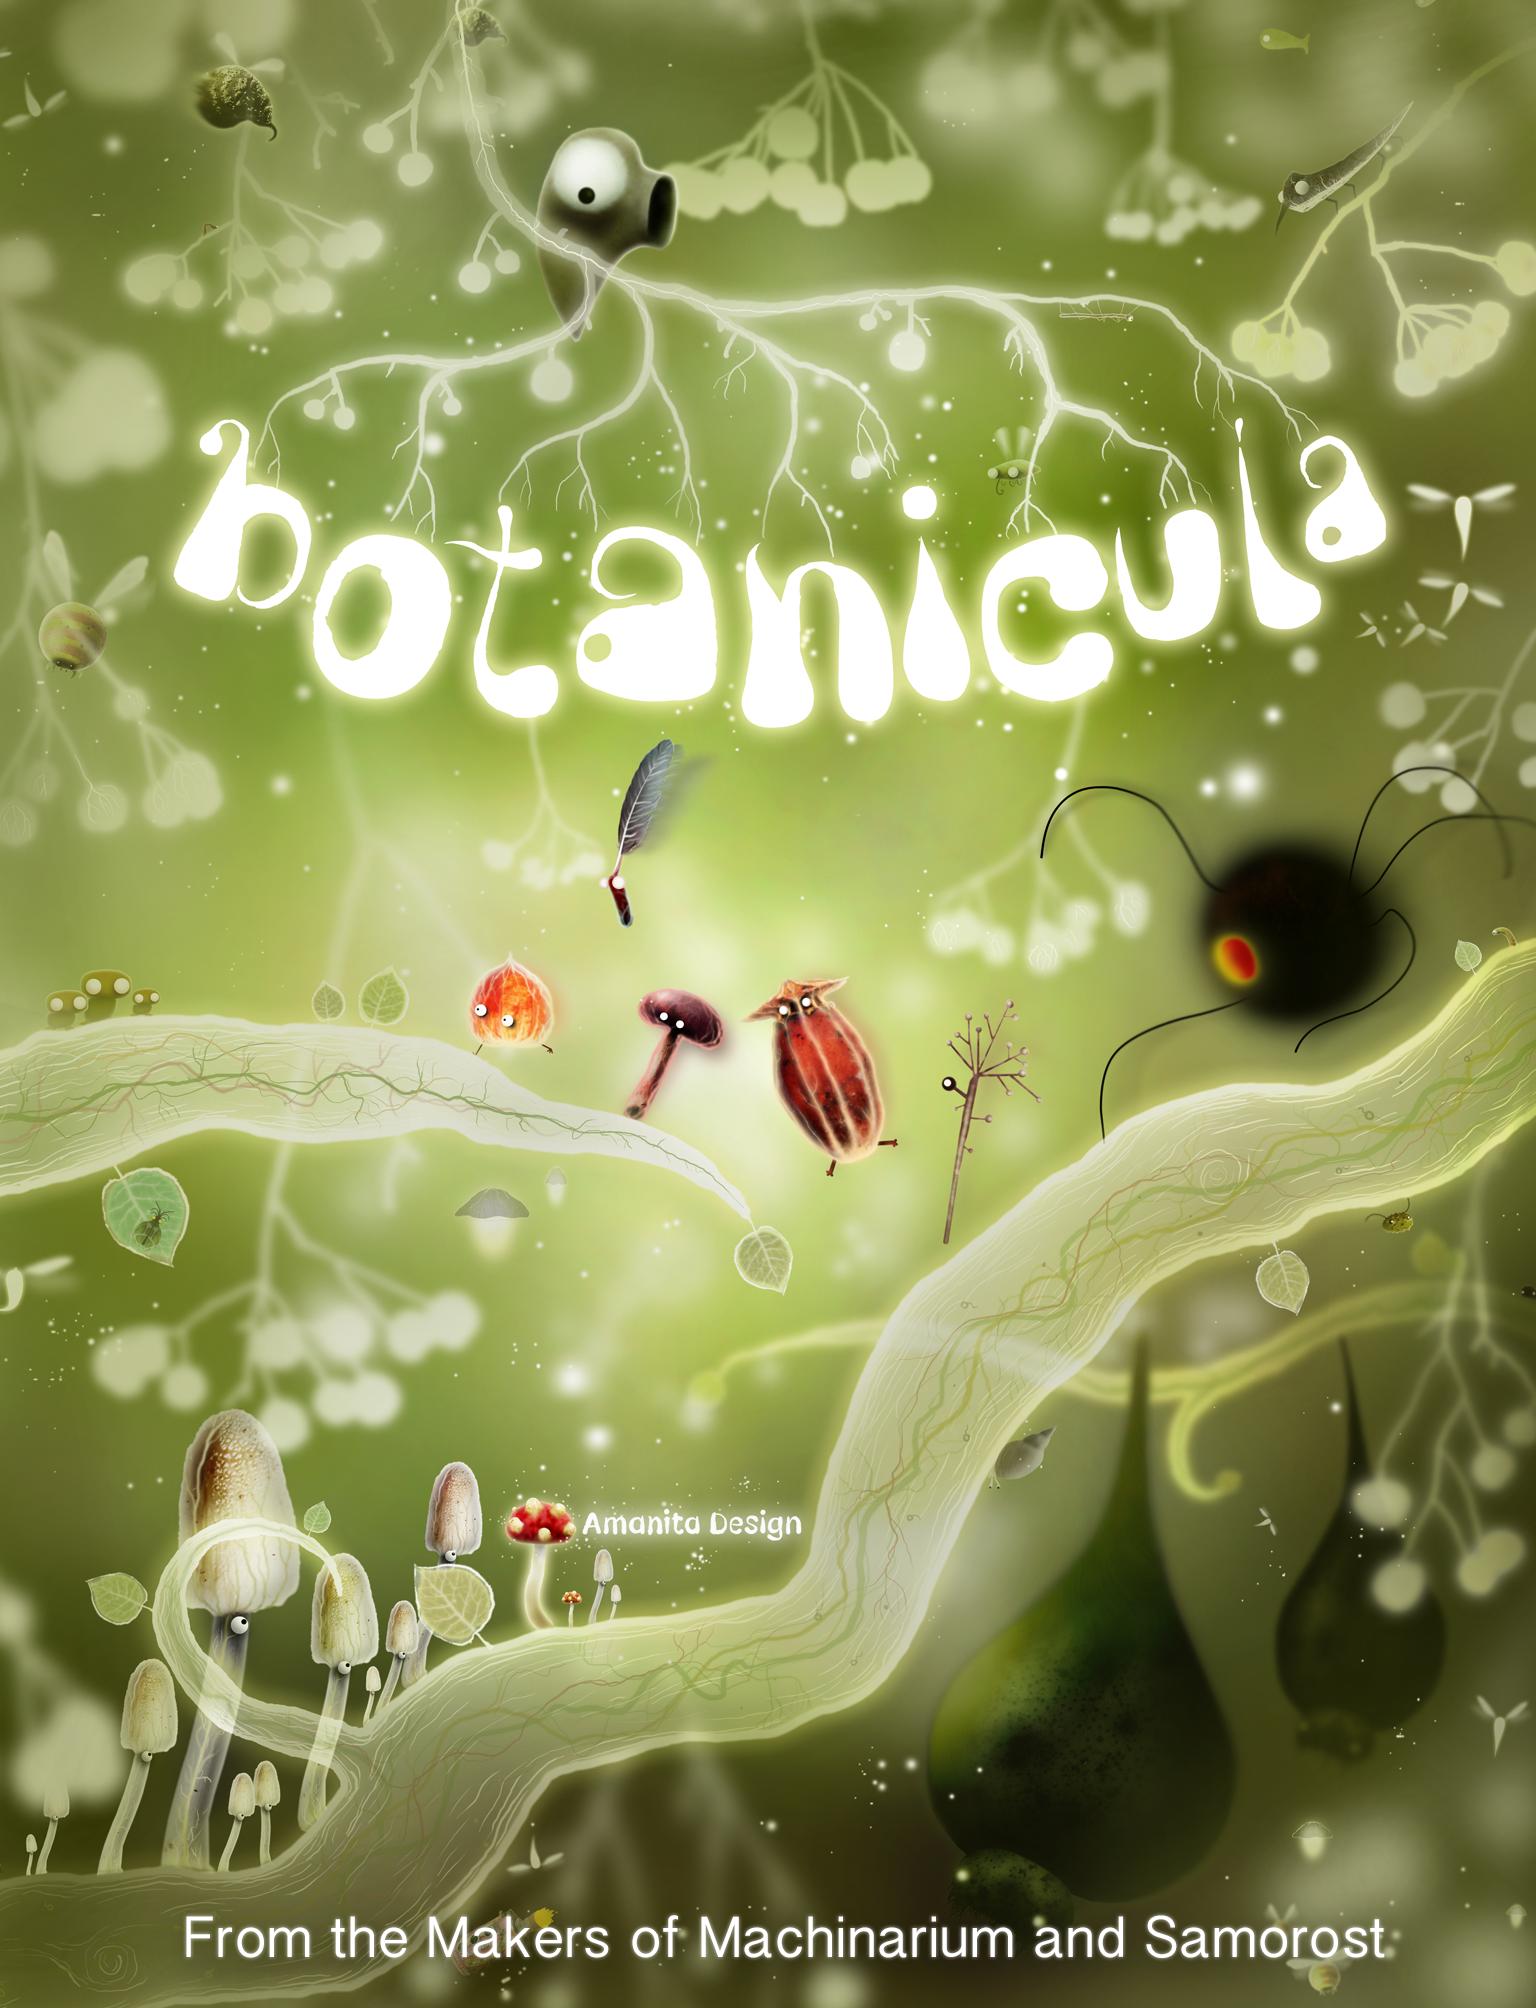 Botanicula screenshot #17